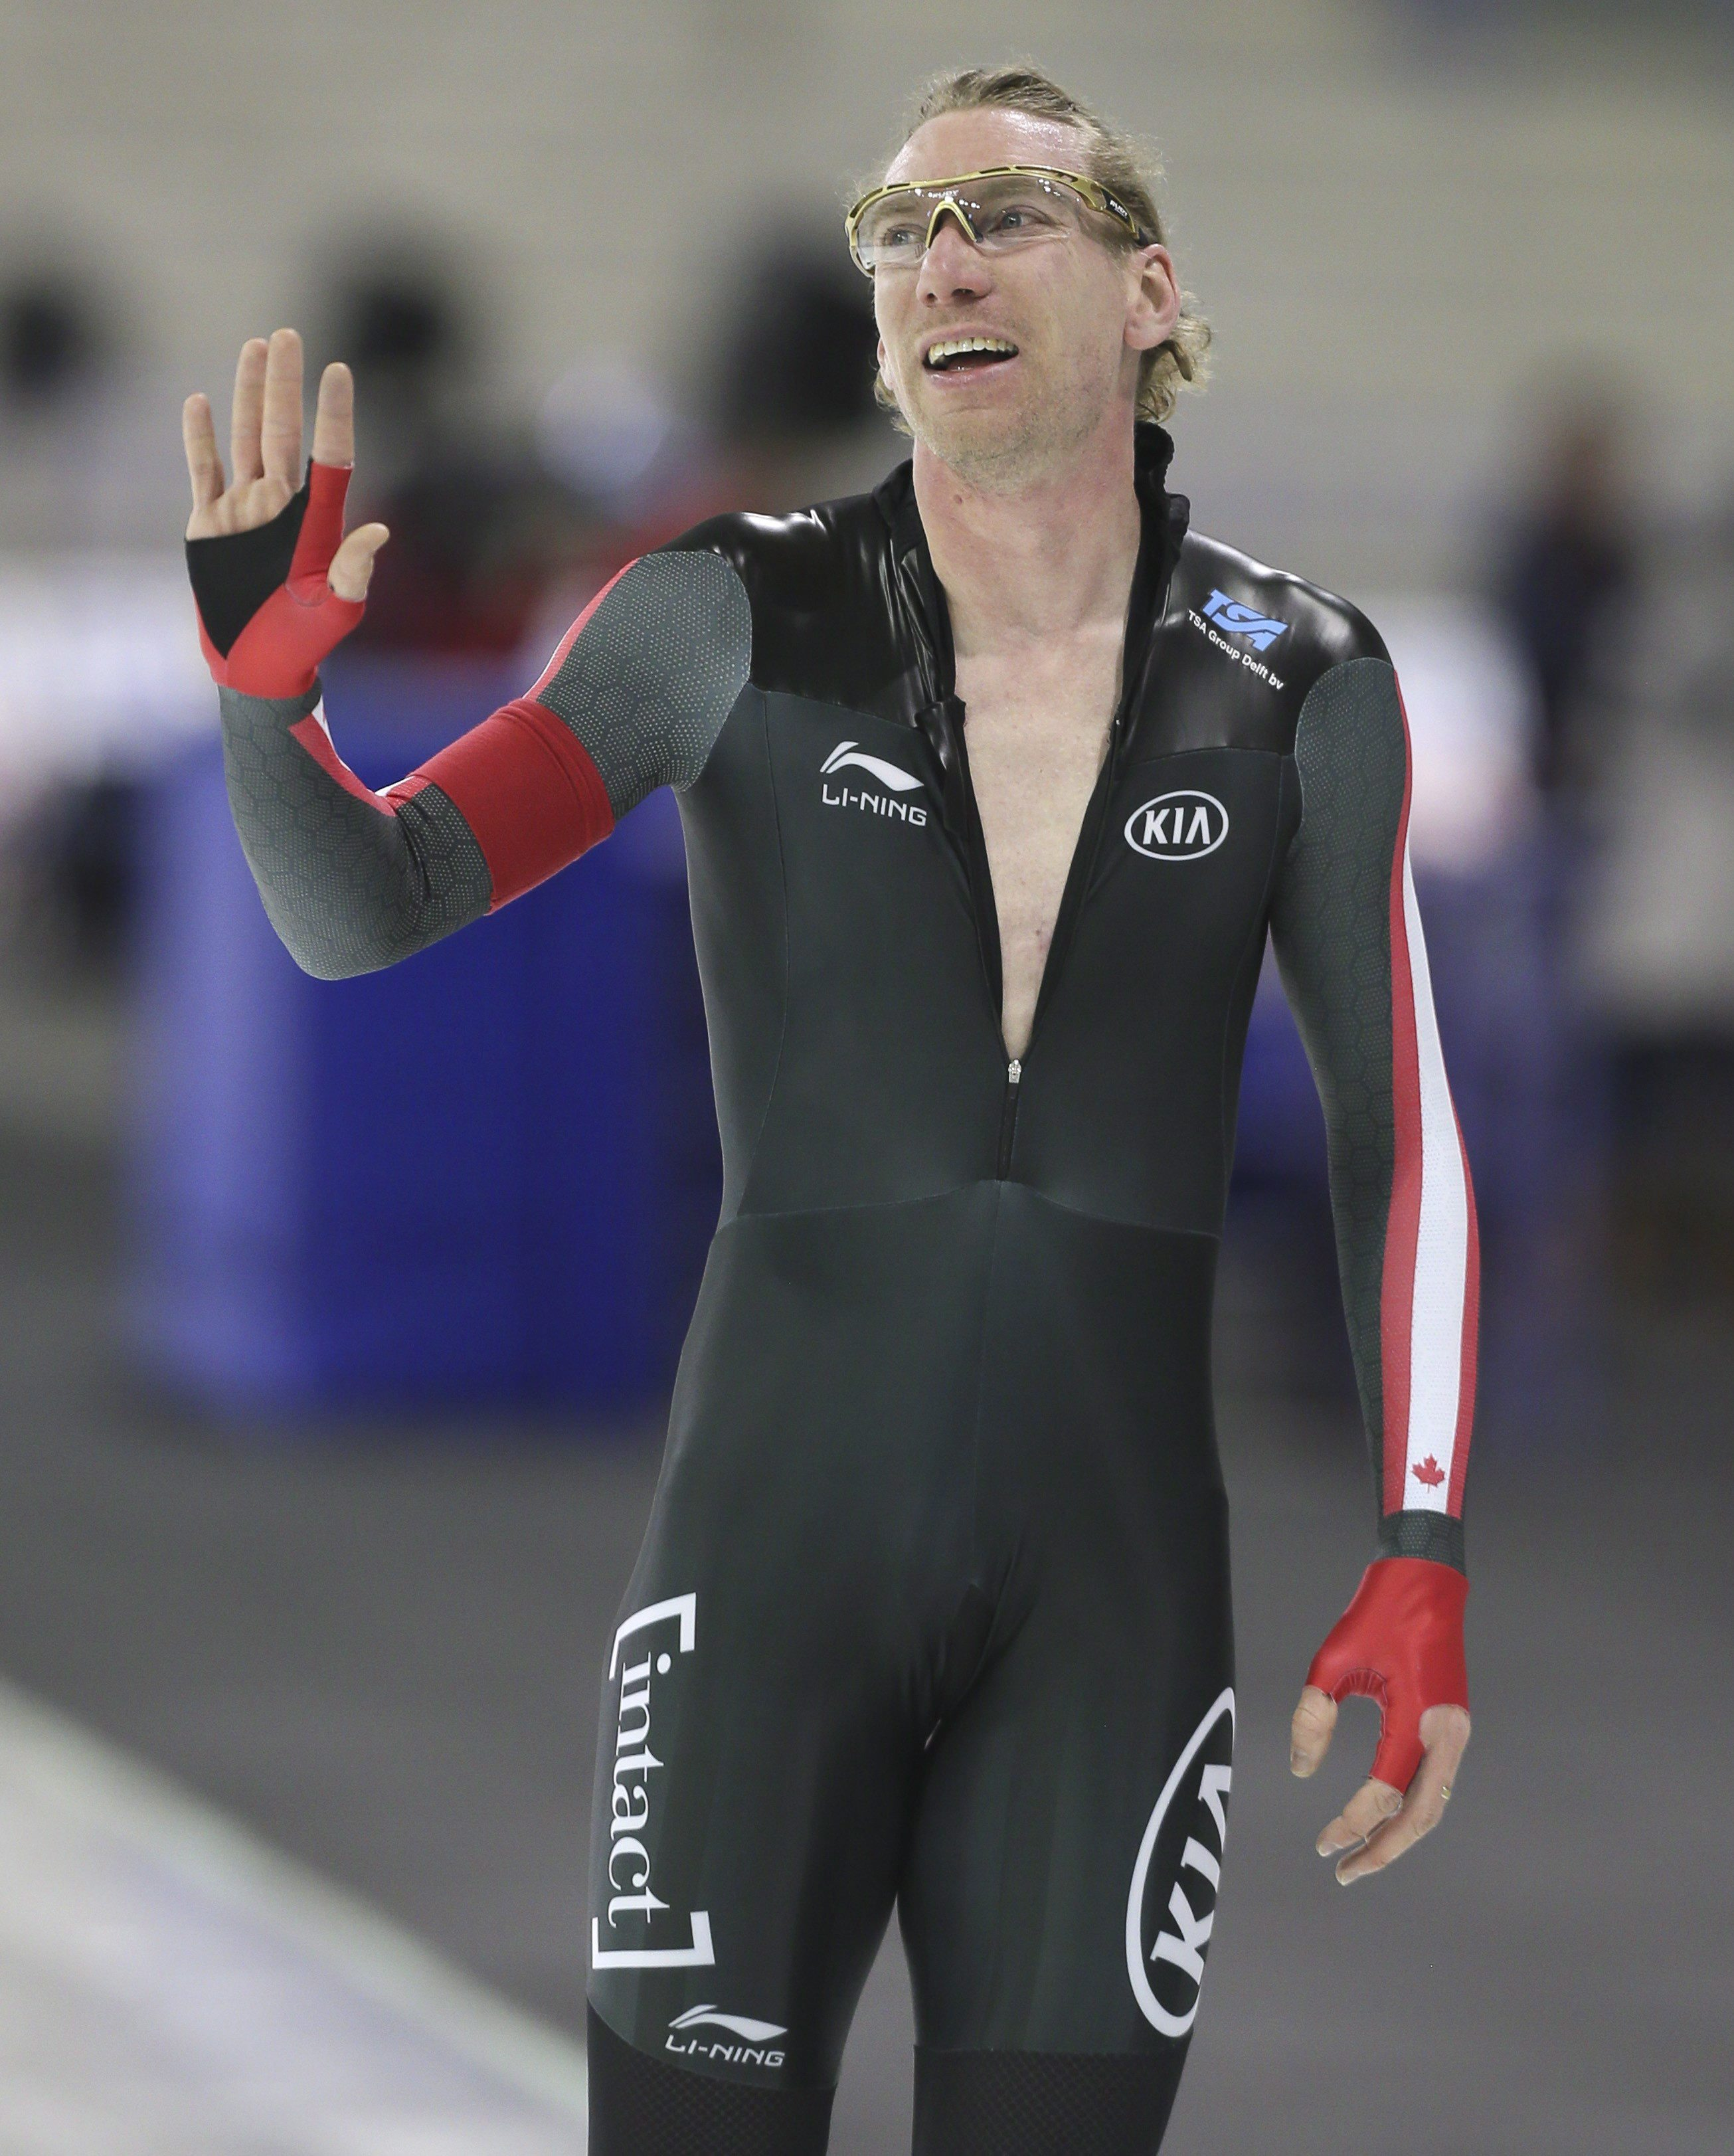 Team Canada - Ted-Jan Bloemen